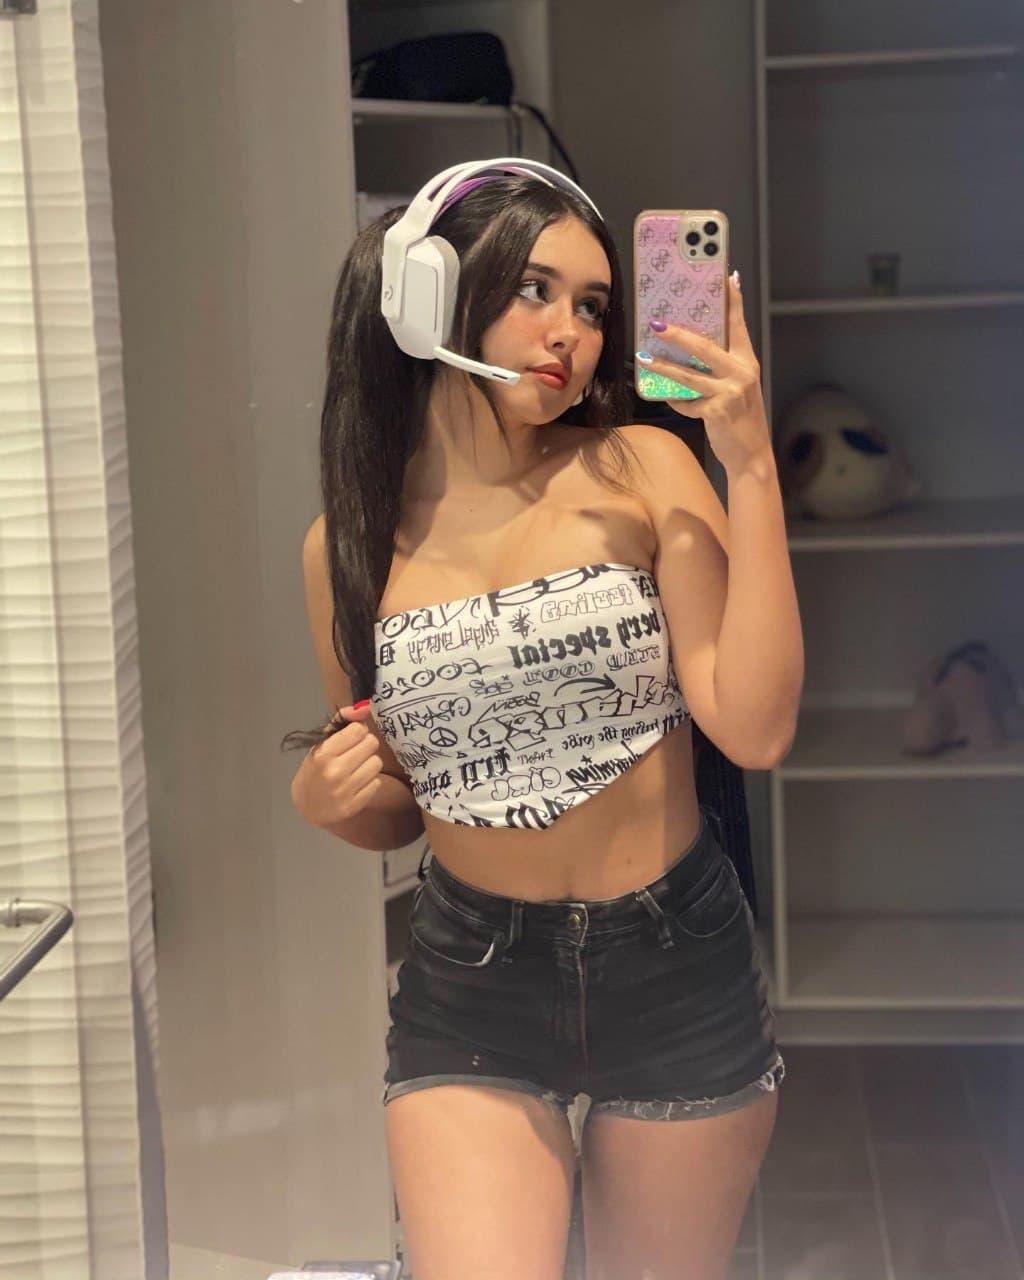 Gamer rica Mostrandose desnuda + Videos 15